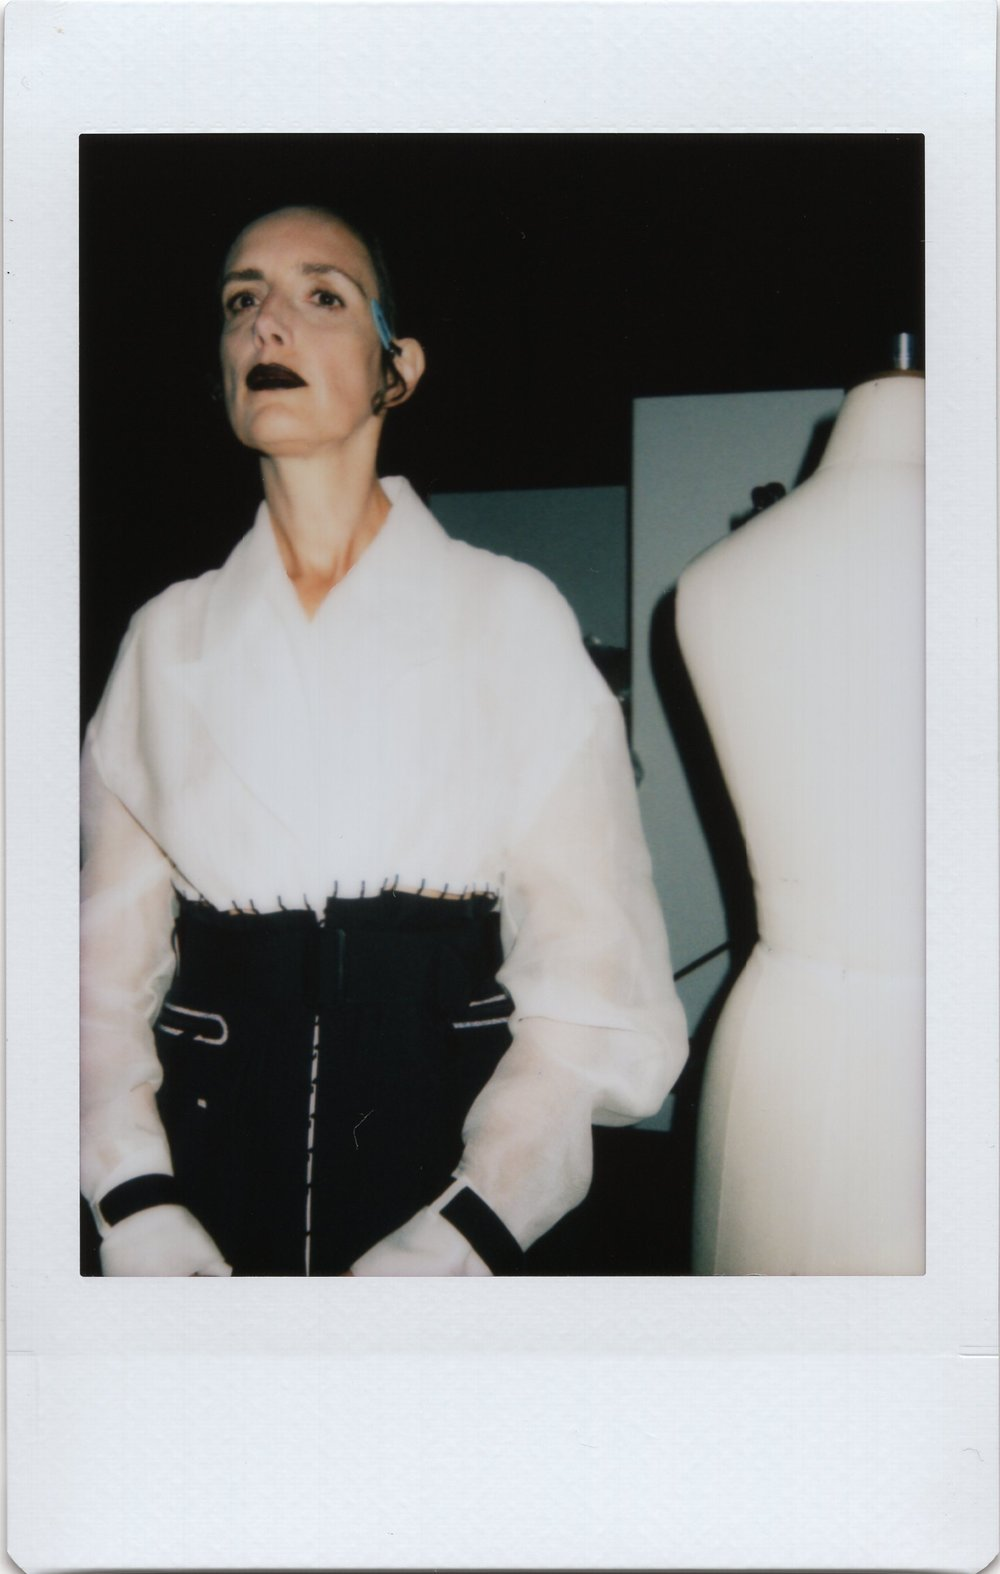 YangLi_Honigschreck_Backstage_Polaroid_5.jpg